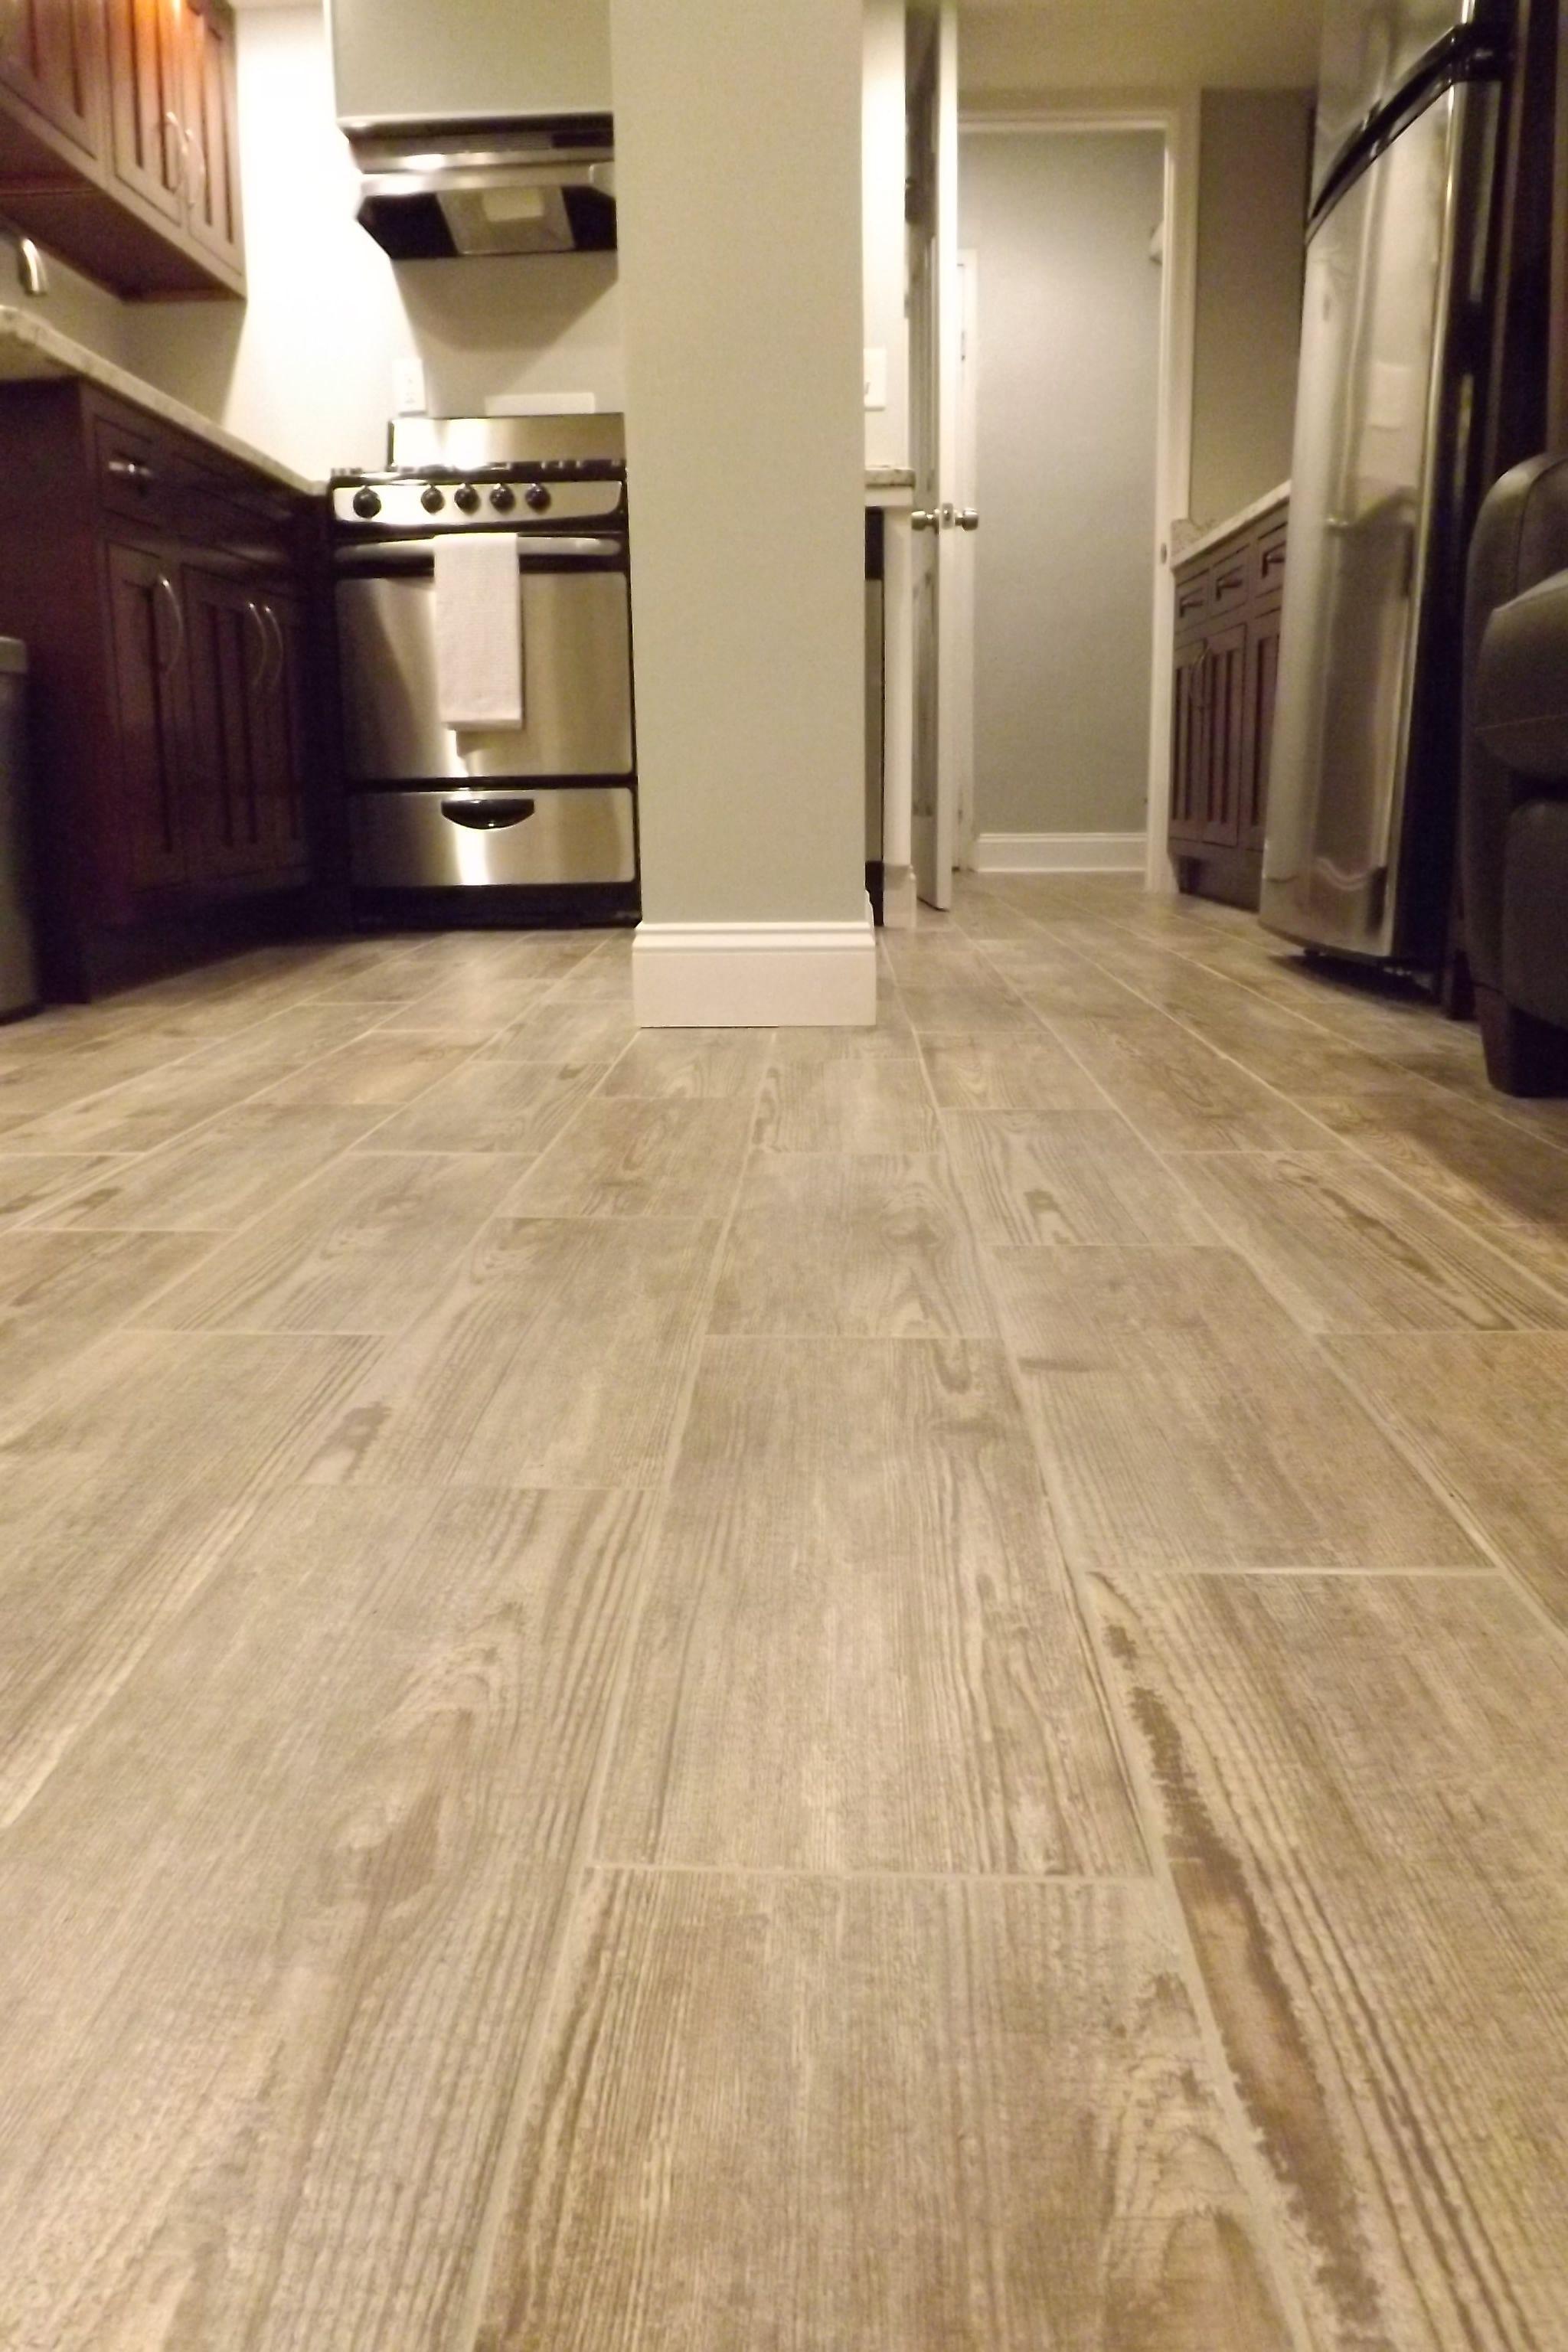 Wood like tiles flooring future remodeling pinterest tile